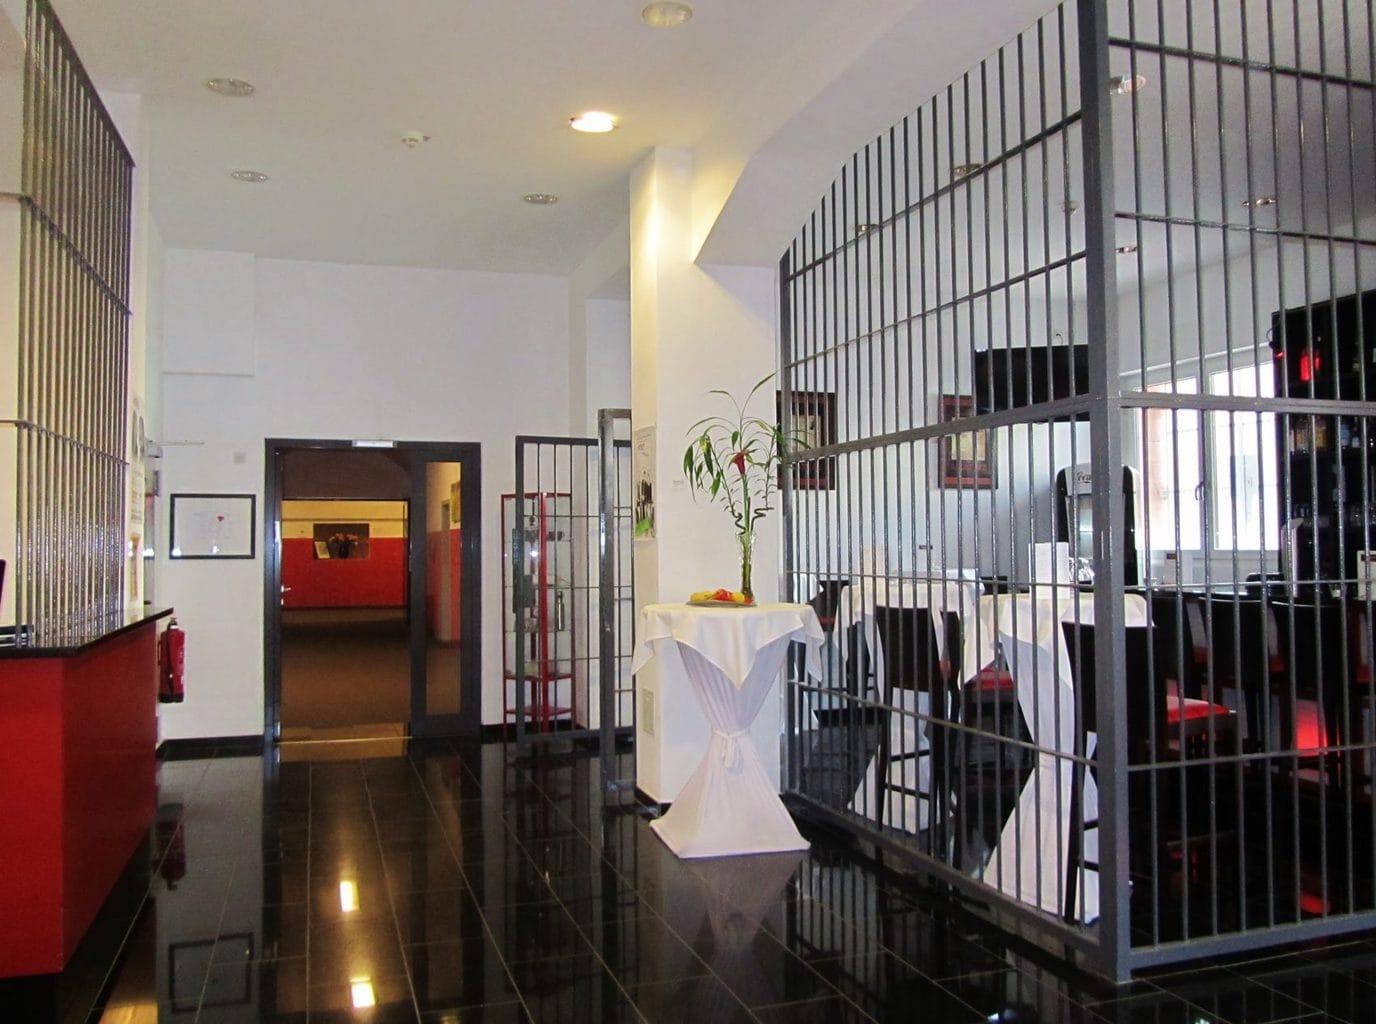 Een kamer in het Alcatraz Hotel in Kaiserslautern